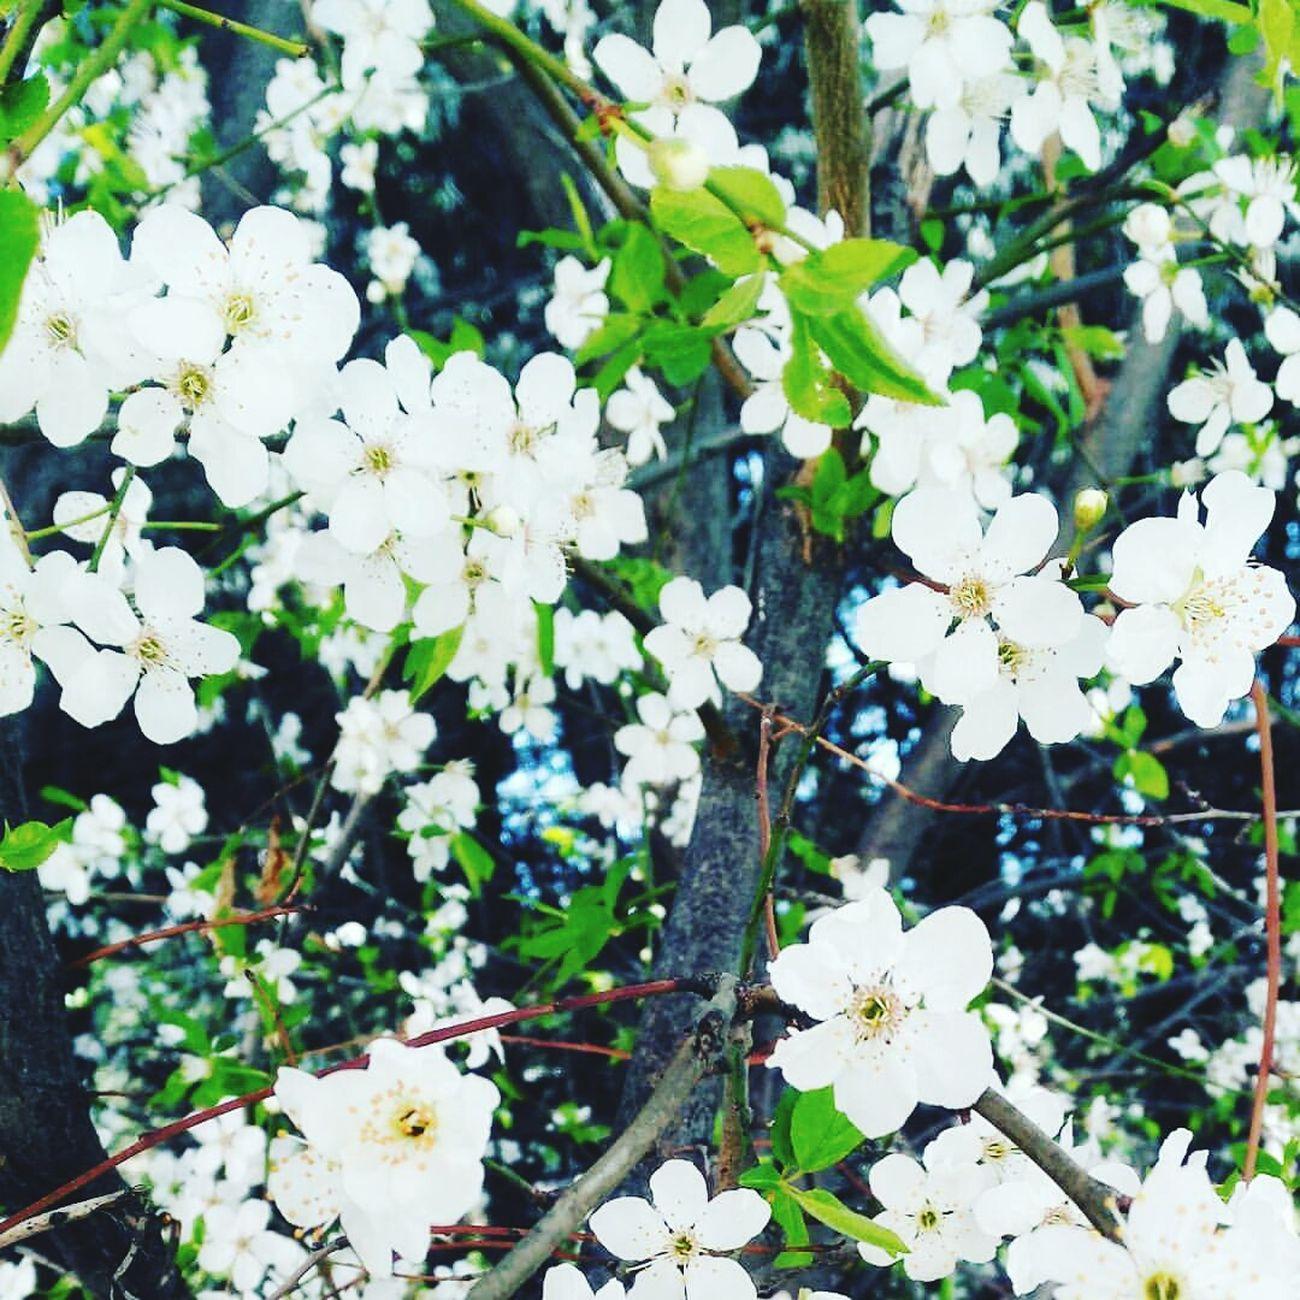 Nature Growth White Color Beauty In Nature Flower Plant Freshness Fragility Outdoors No People Leaf Day Close-up Flower Head Turkey Ilkbahar Türkiye Nature Vodafone Smart Ultra 6 Burdur